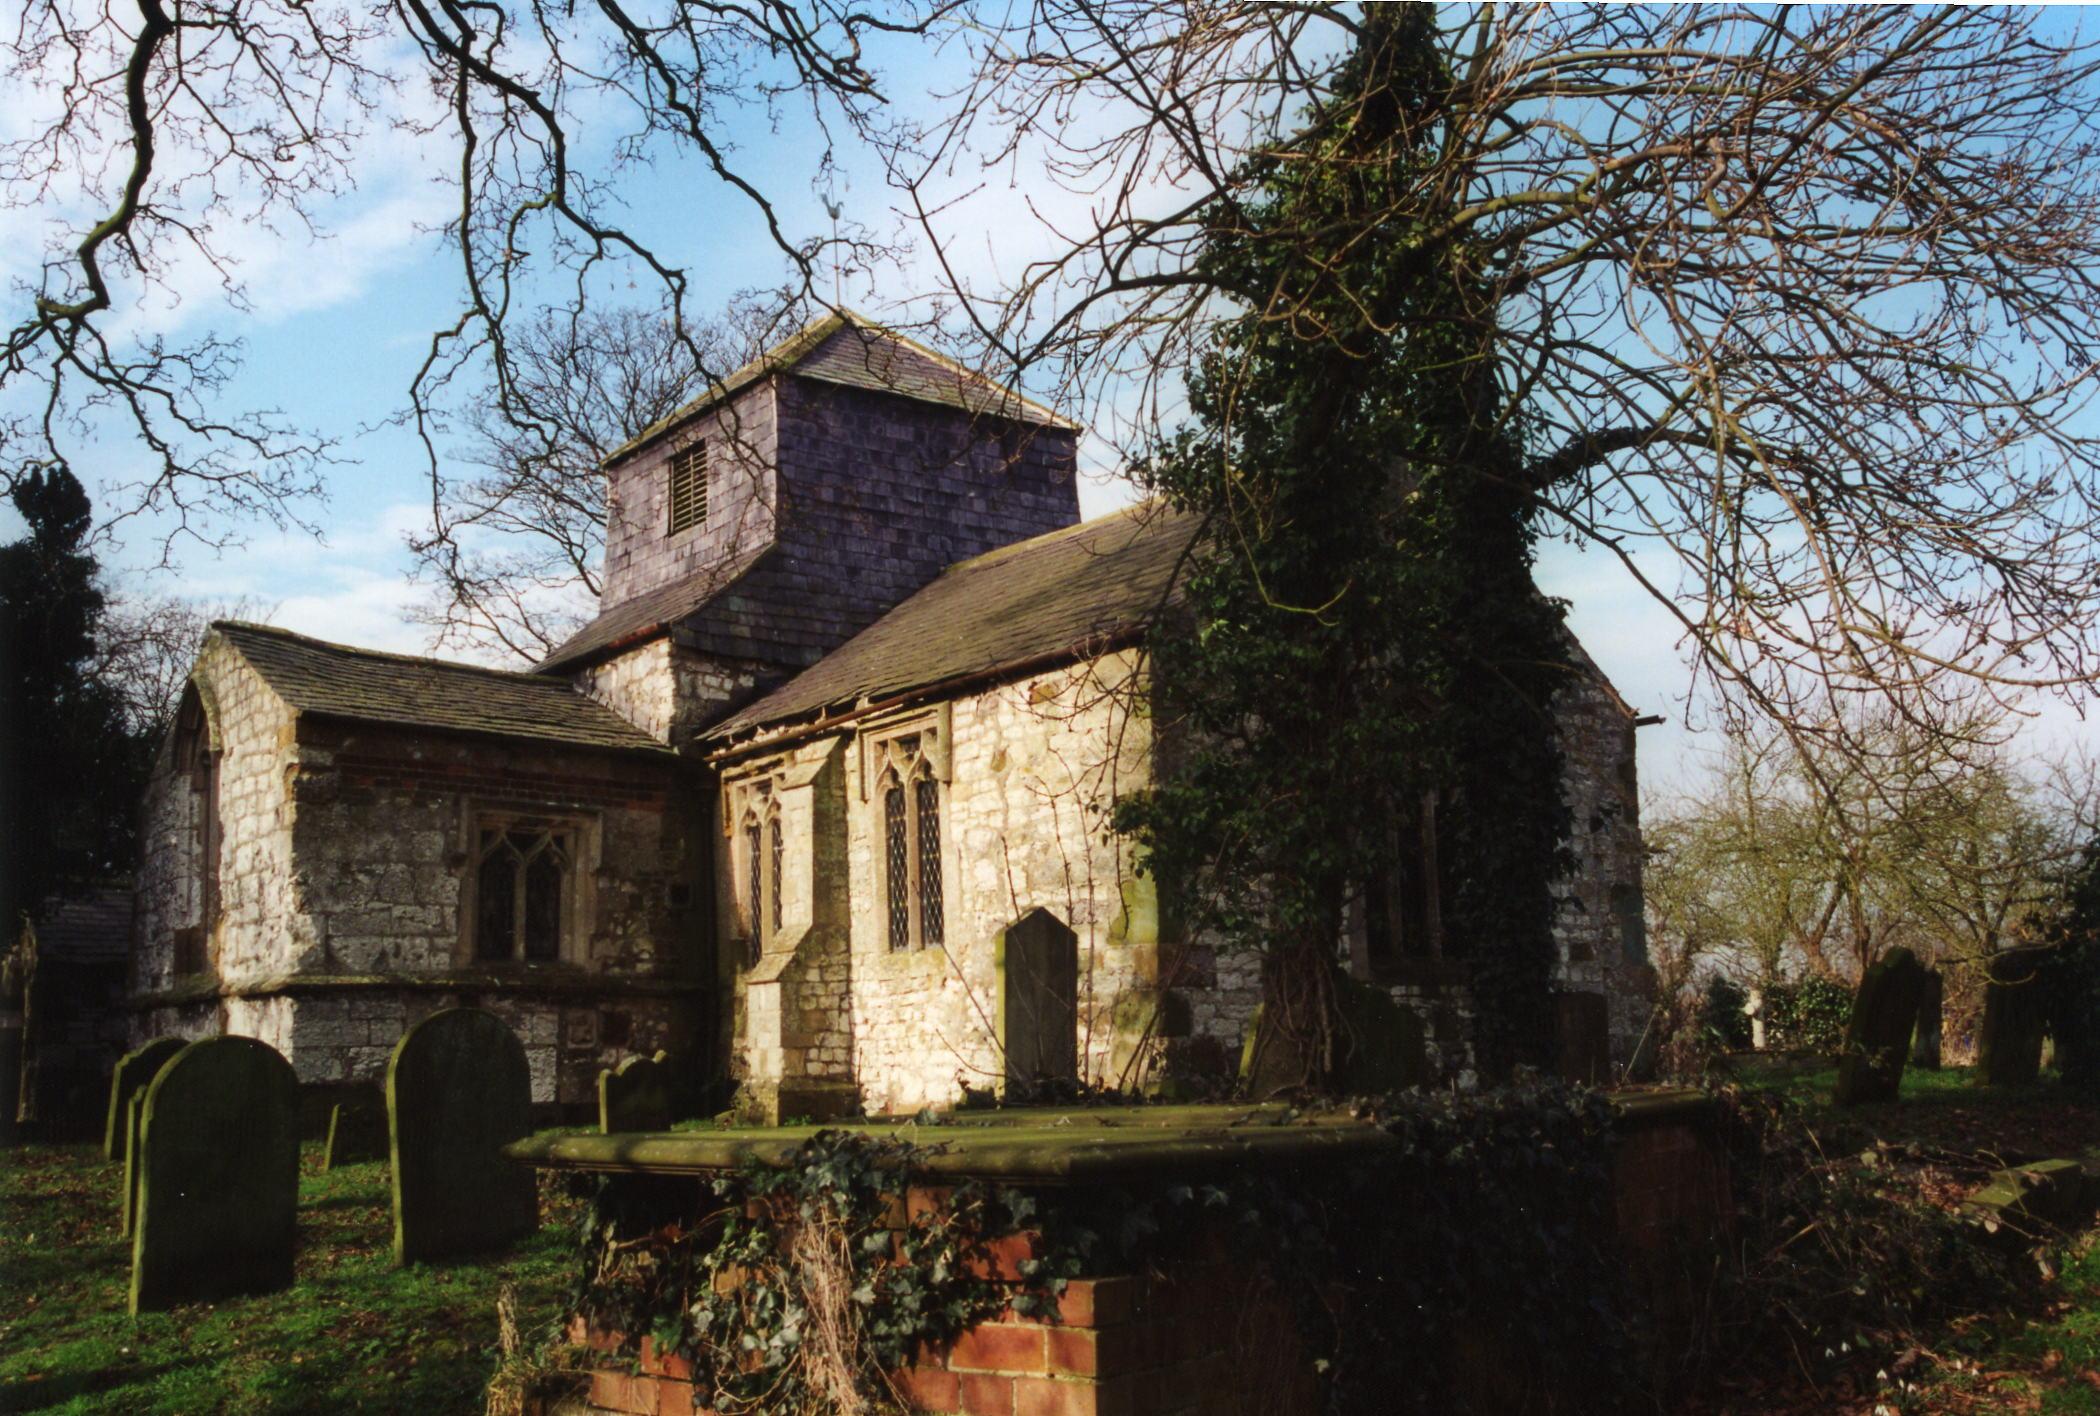 Covenham St. Bartholomew